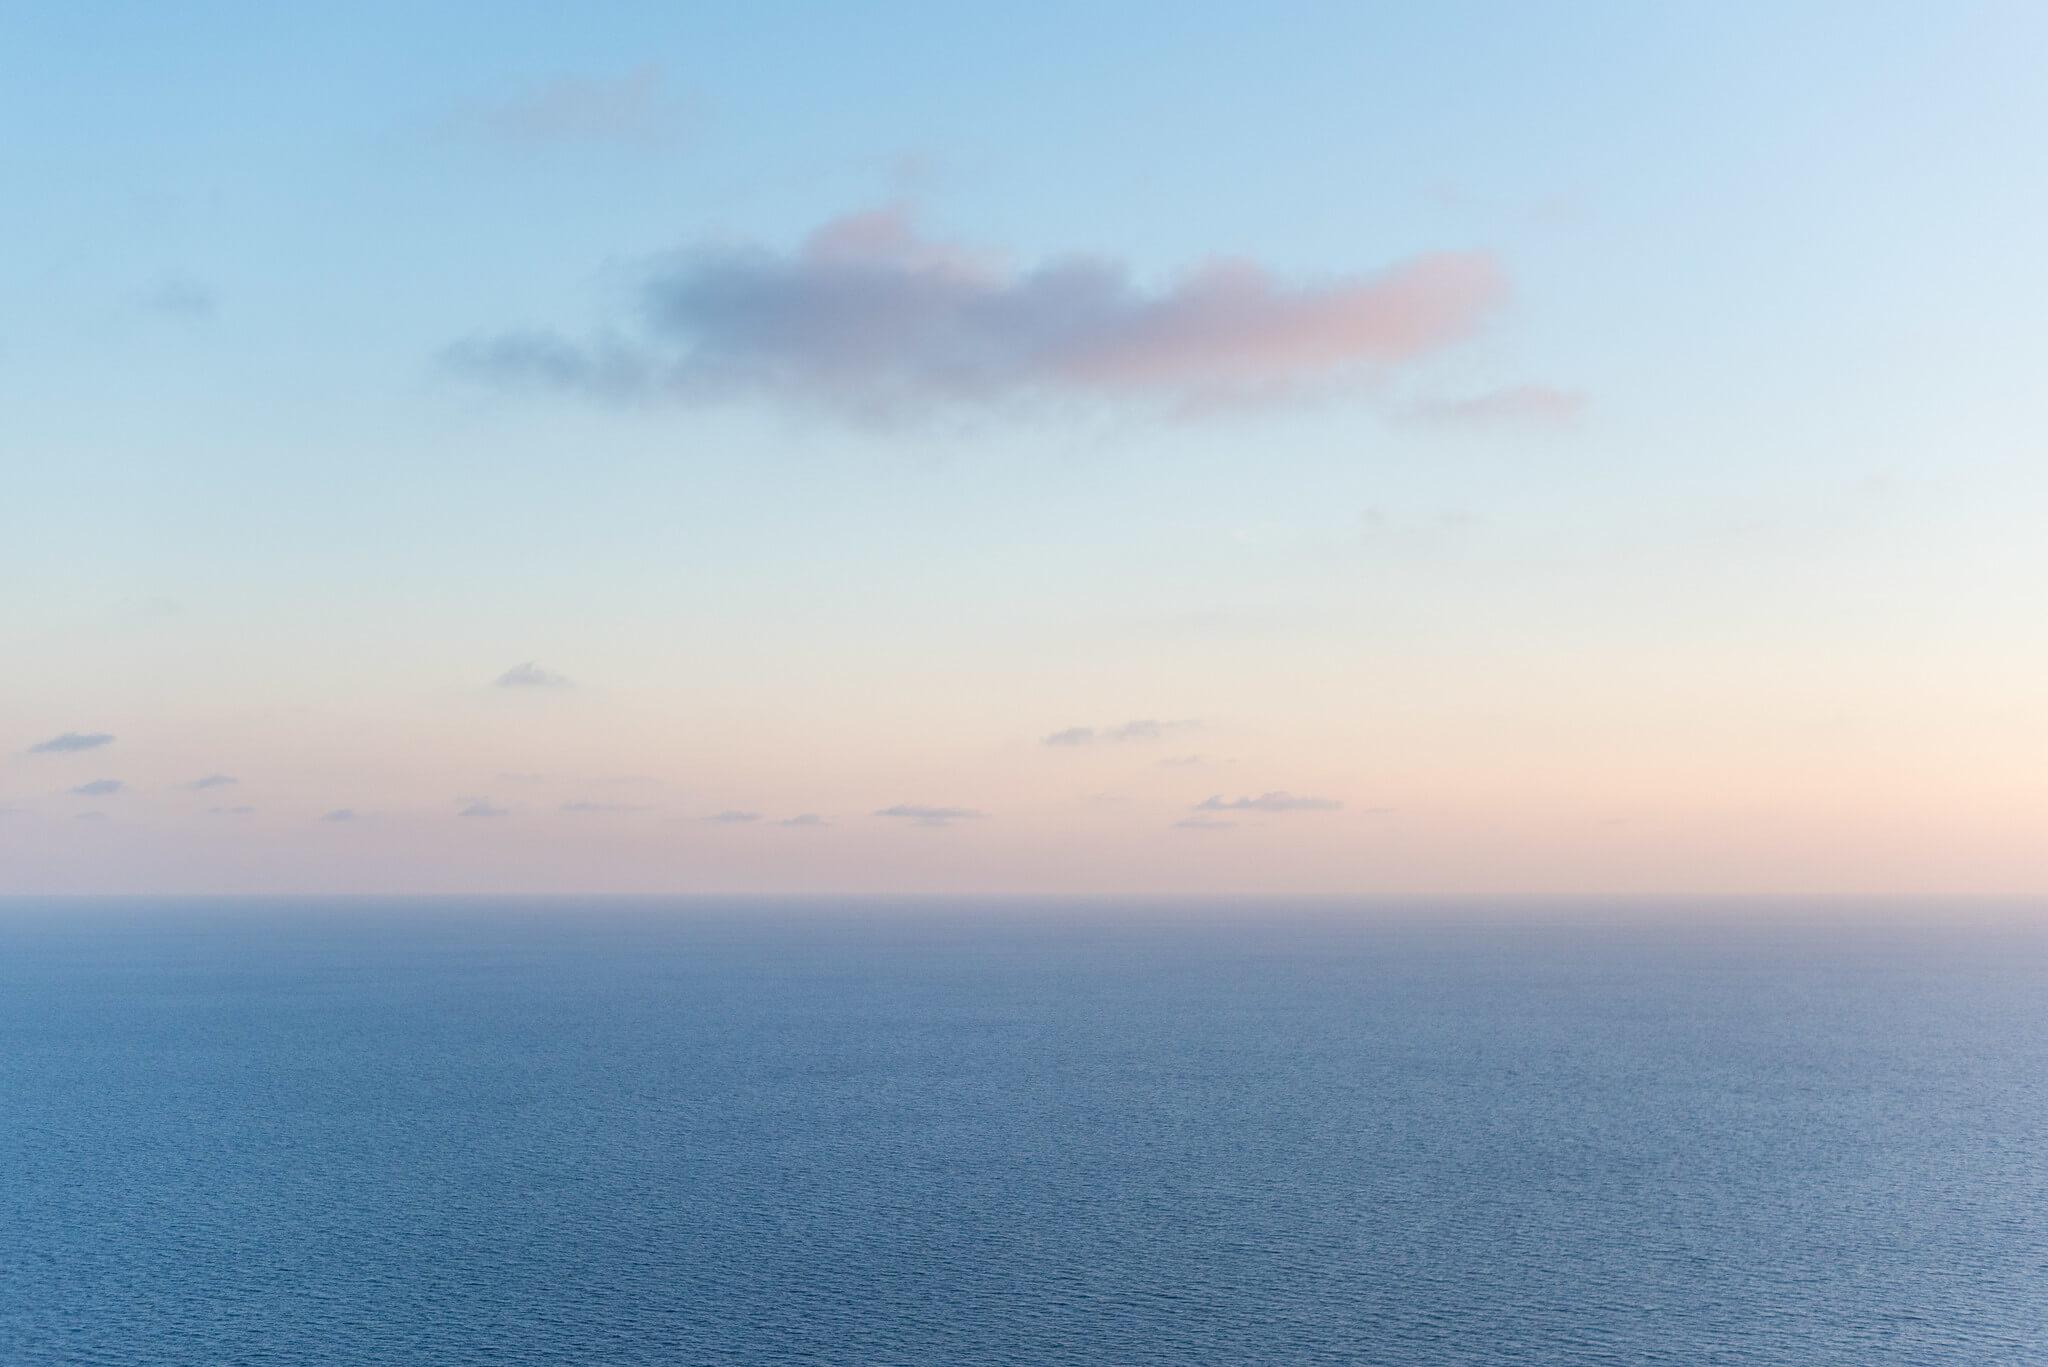 https://www.white-ibiza.com/wp-content/uploads/2020/03/ibiza-sunsets-es-vedra-2020-02.jpg